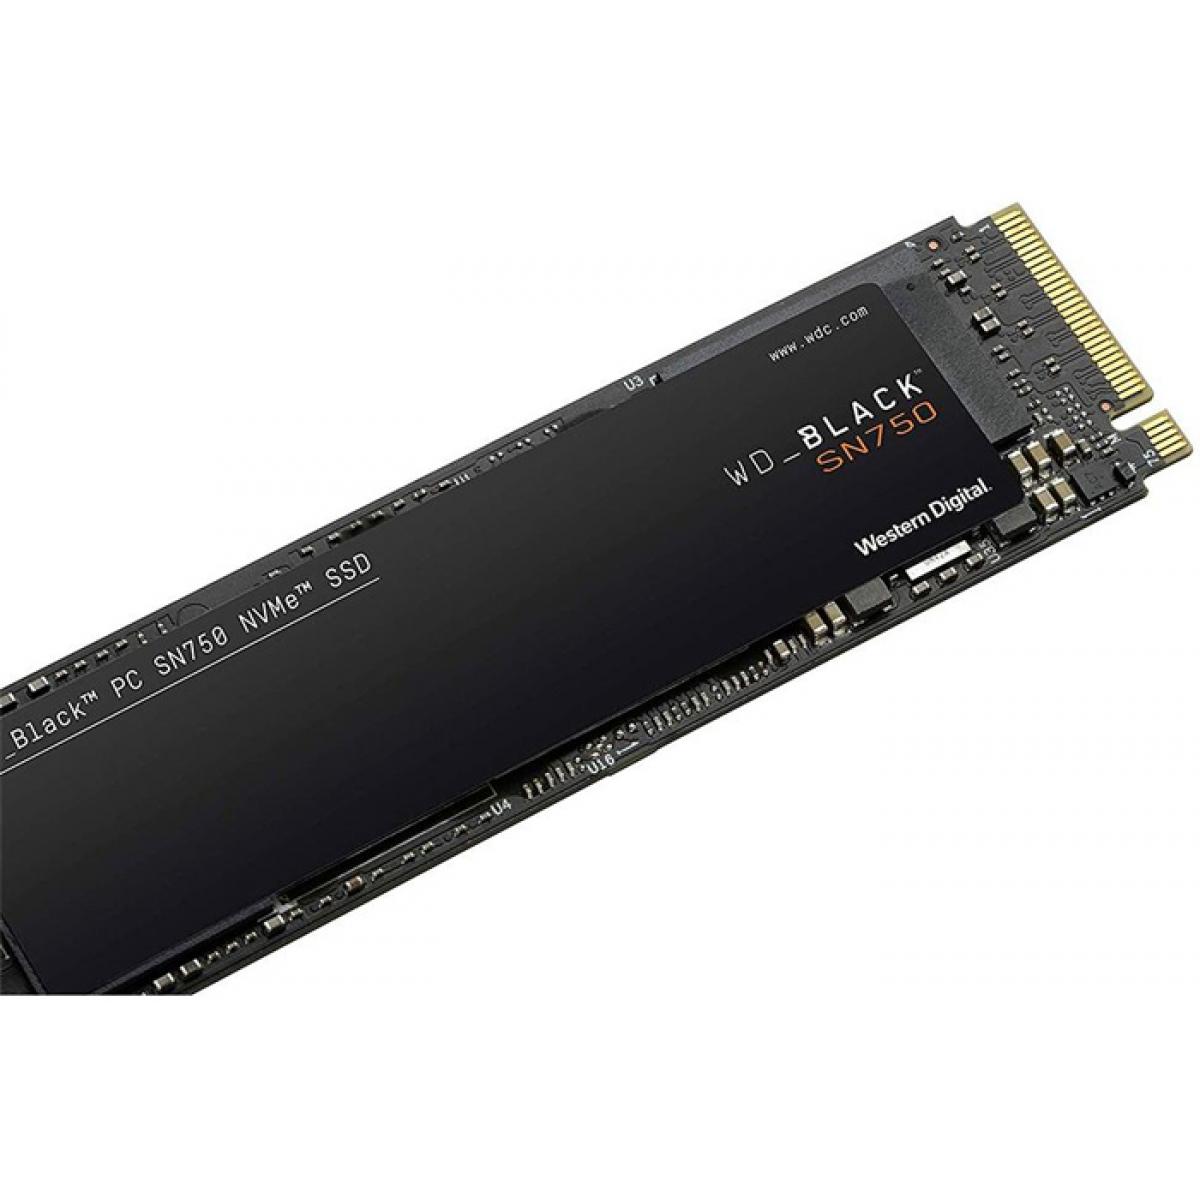 SSD WD Black SN750 500GB, M.2 2280, Leitura: 3430MBs e Gravação: 2600MBs, WDS500G3X0C